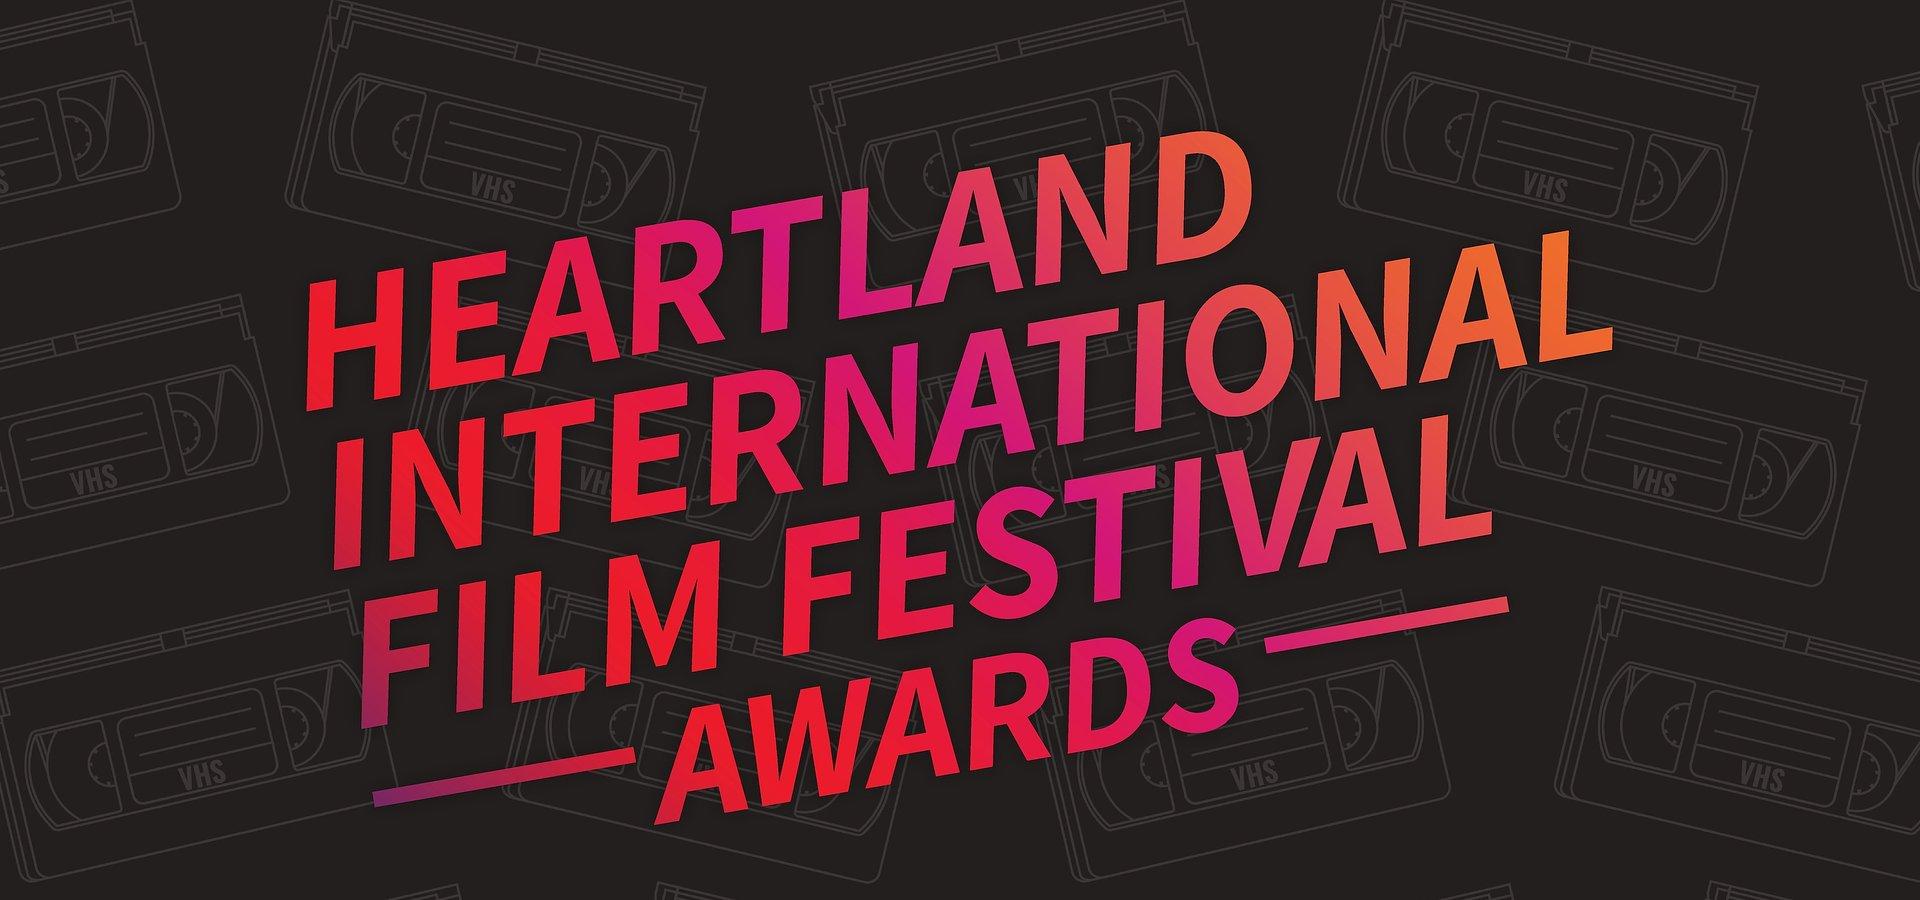 30TH HEARTLAND INTERNATIONAL FILM FESTIVAL ANNOUNCES AWARD WINNERS AND ADDITIONAL SCREENINGS